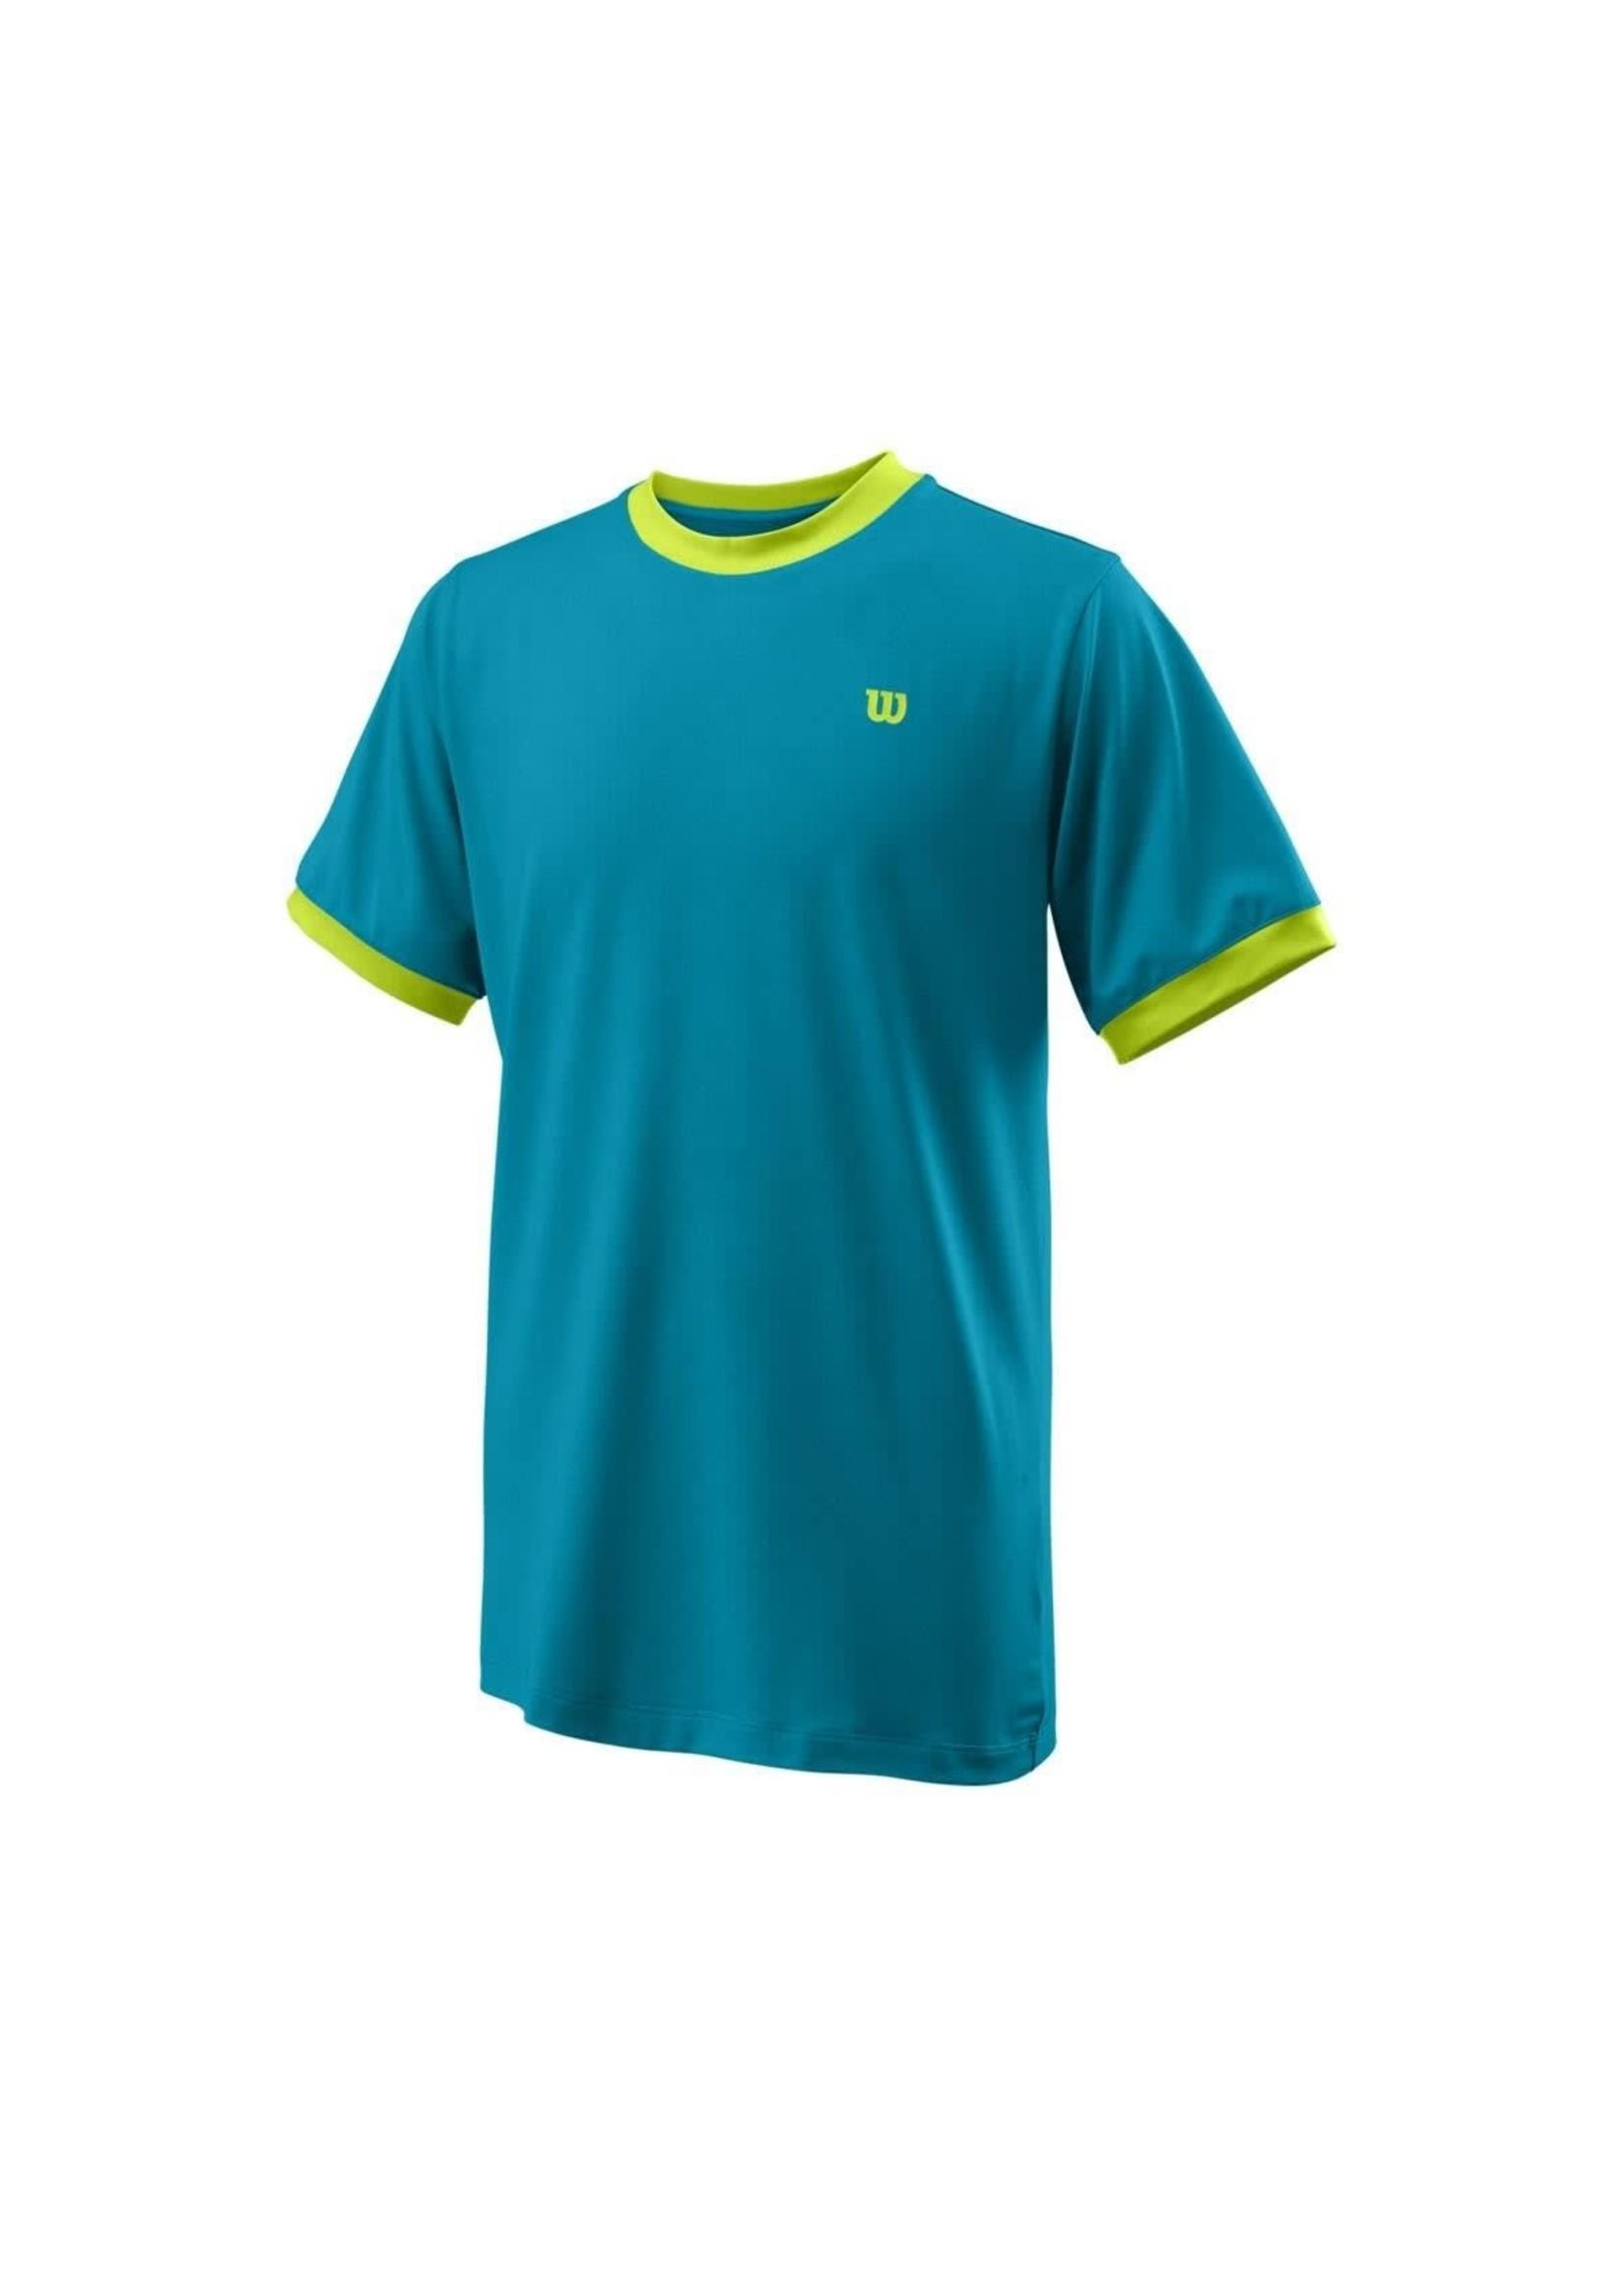 Wilson Wilson Competition Crew Junior T shirt (2021) - Barrier Reef